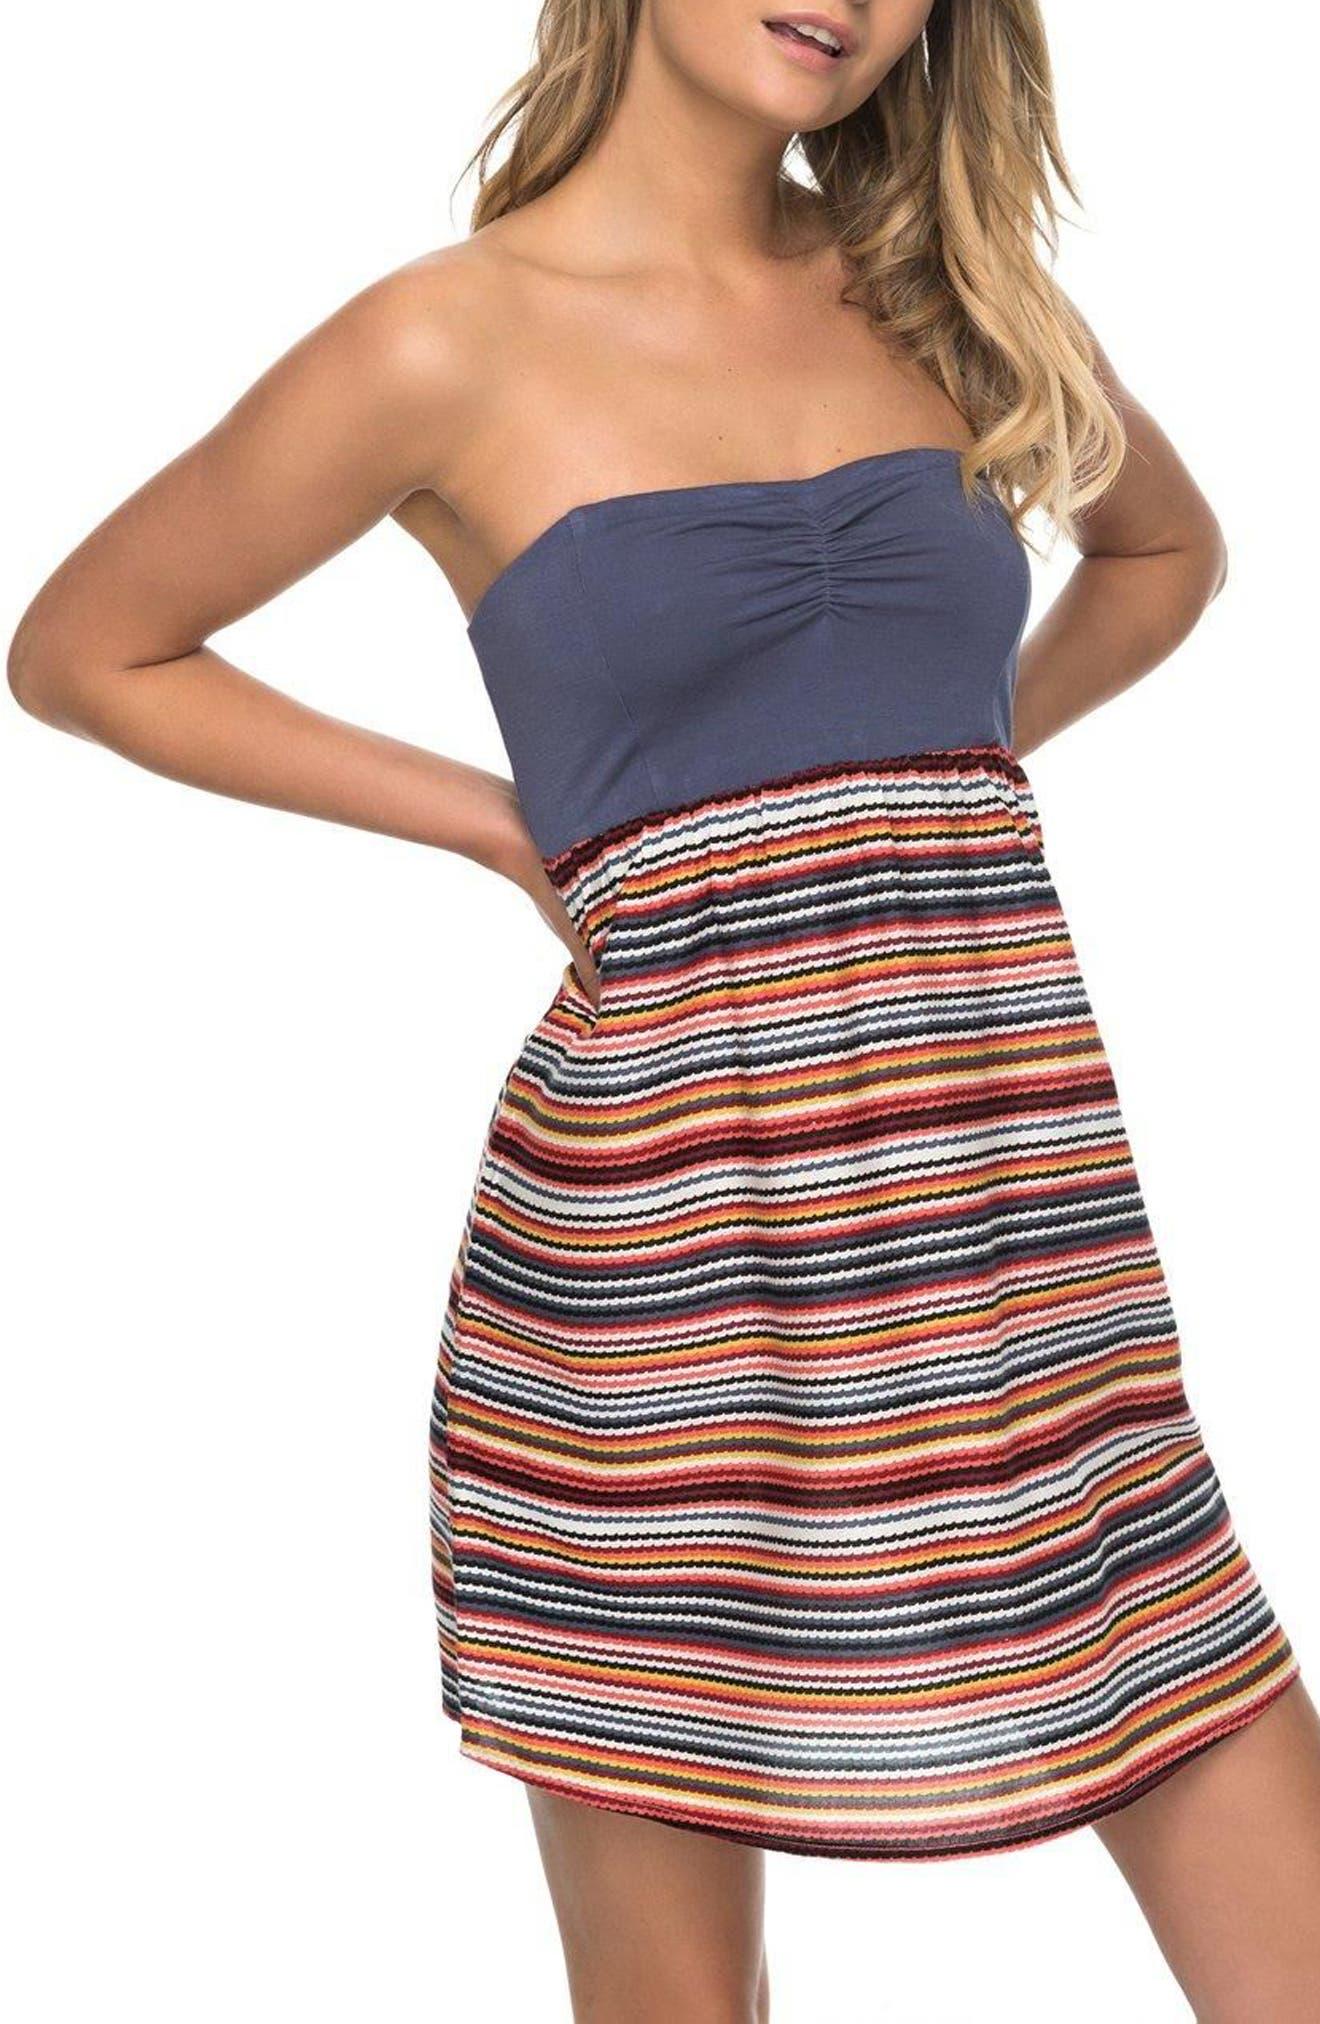 Ocean Romance Strapless Dress,                             Main thumbnail 1, color,                             Rio Red Zigzag Stripe